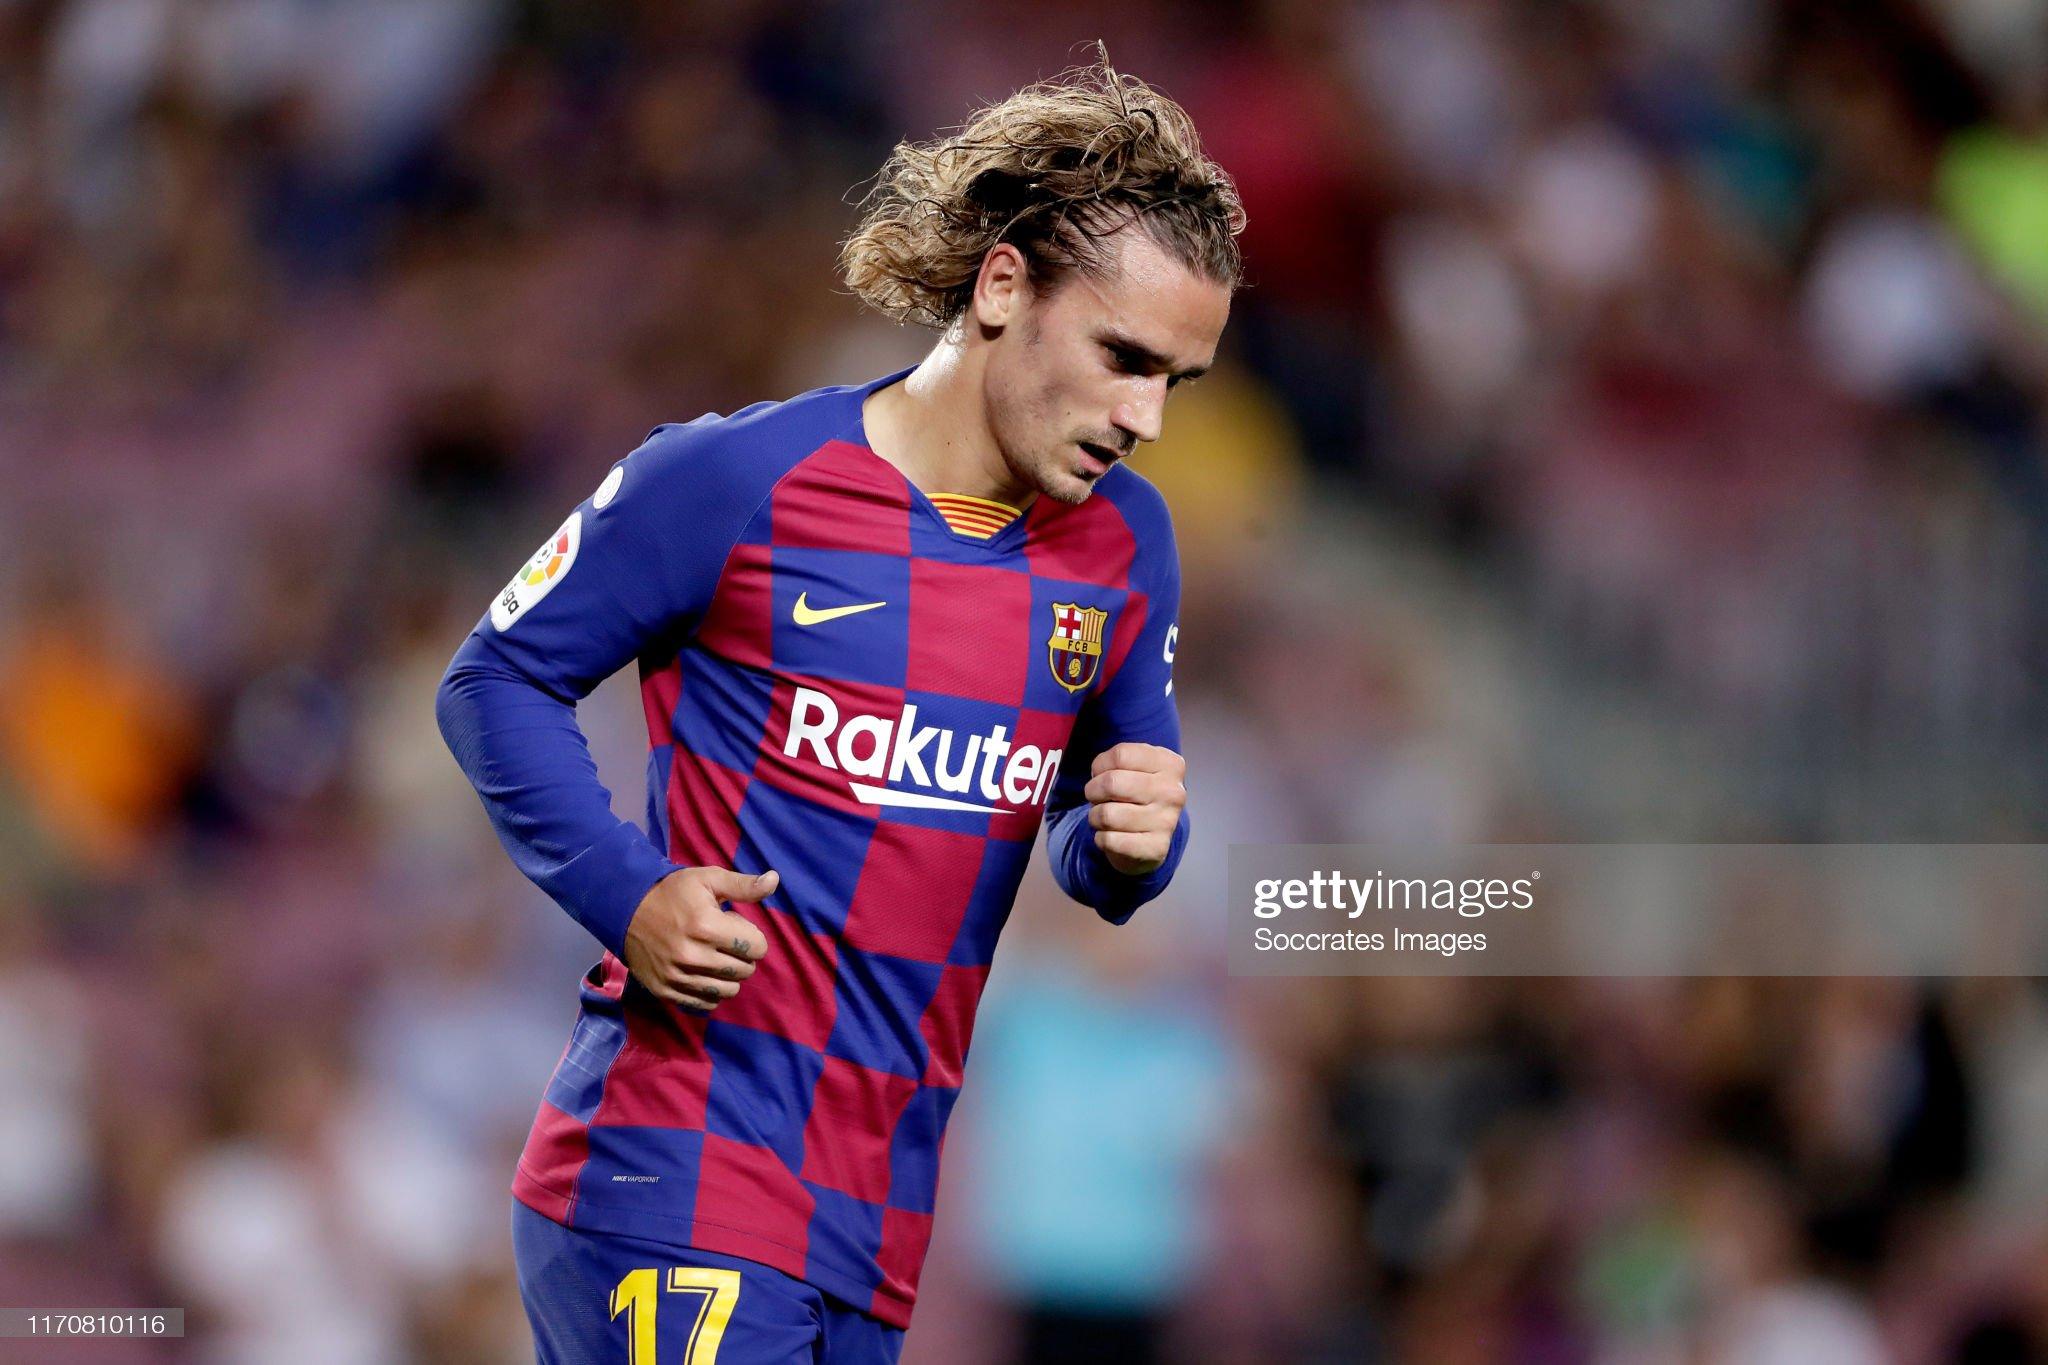 صور مباراة : برشلونة - فياريال 2-1 ( 24-09-2019 )  Antoine-griezmann-of-fc-barcelona-during-the-la-liga-santander-match-picture-id1170810116?s=2048x2048